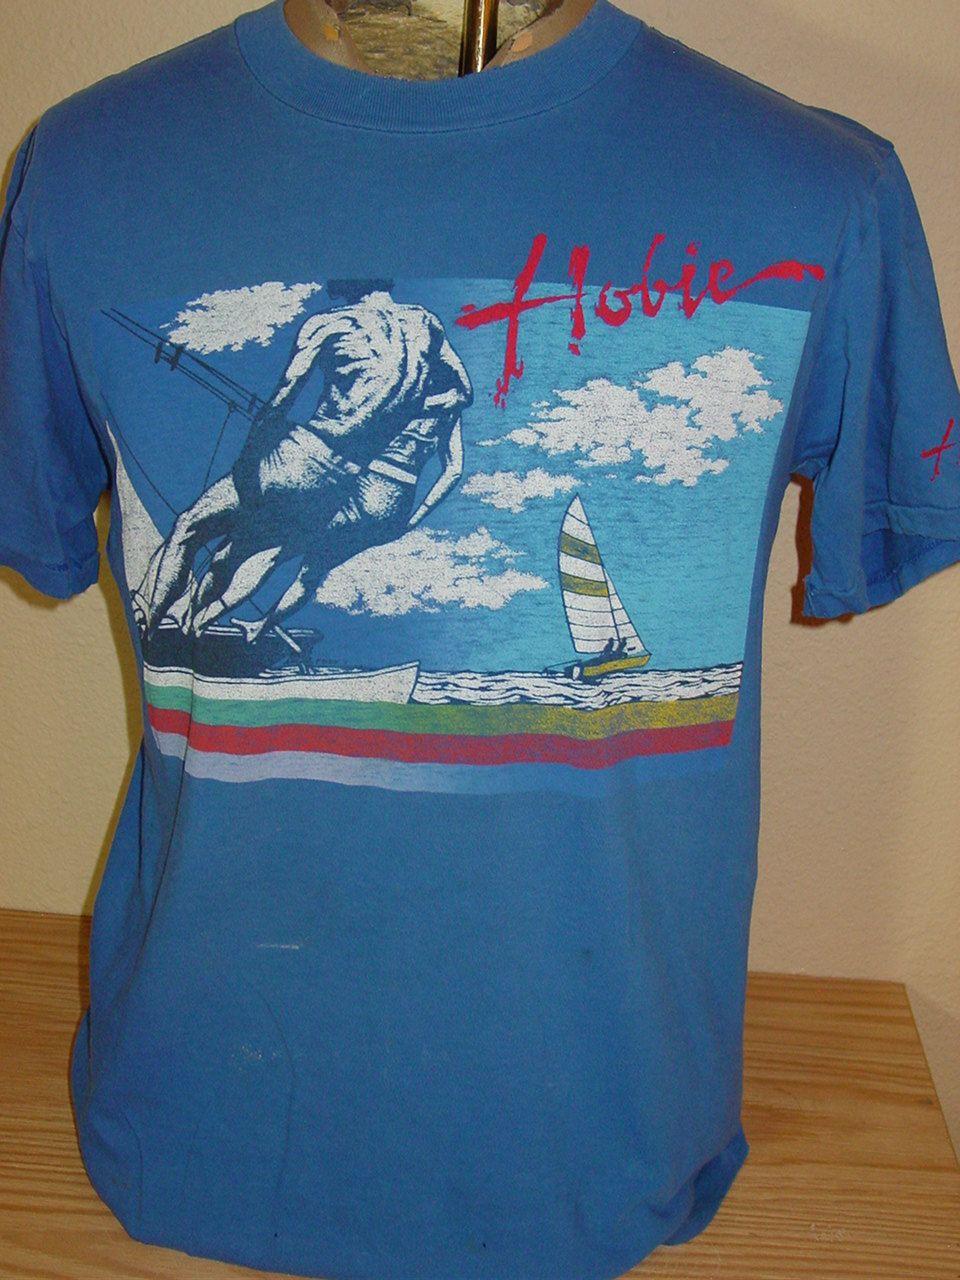 a638e06905 Vintage 1980s Hobie beach surf t shirt Large by vintagerhino247 on ...